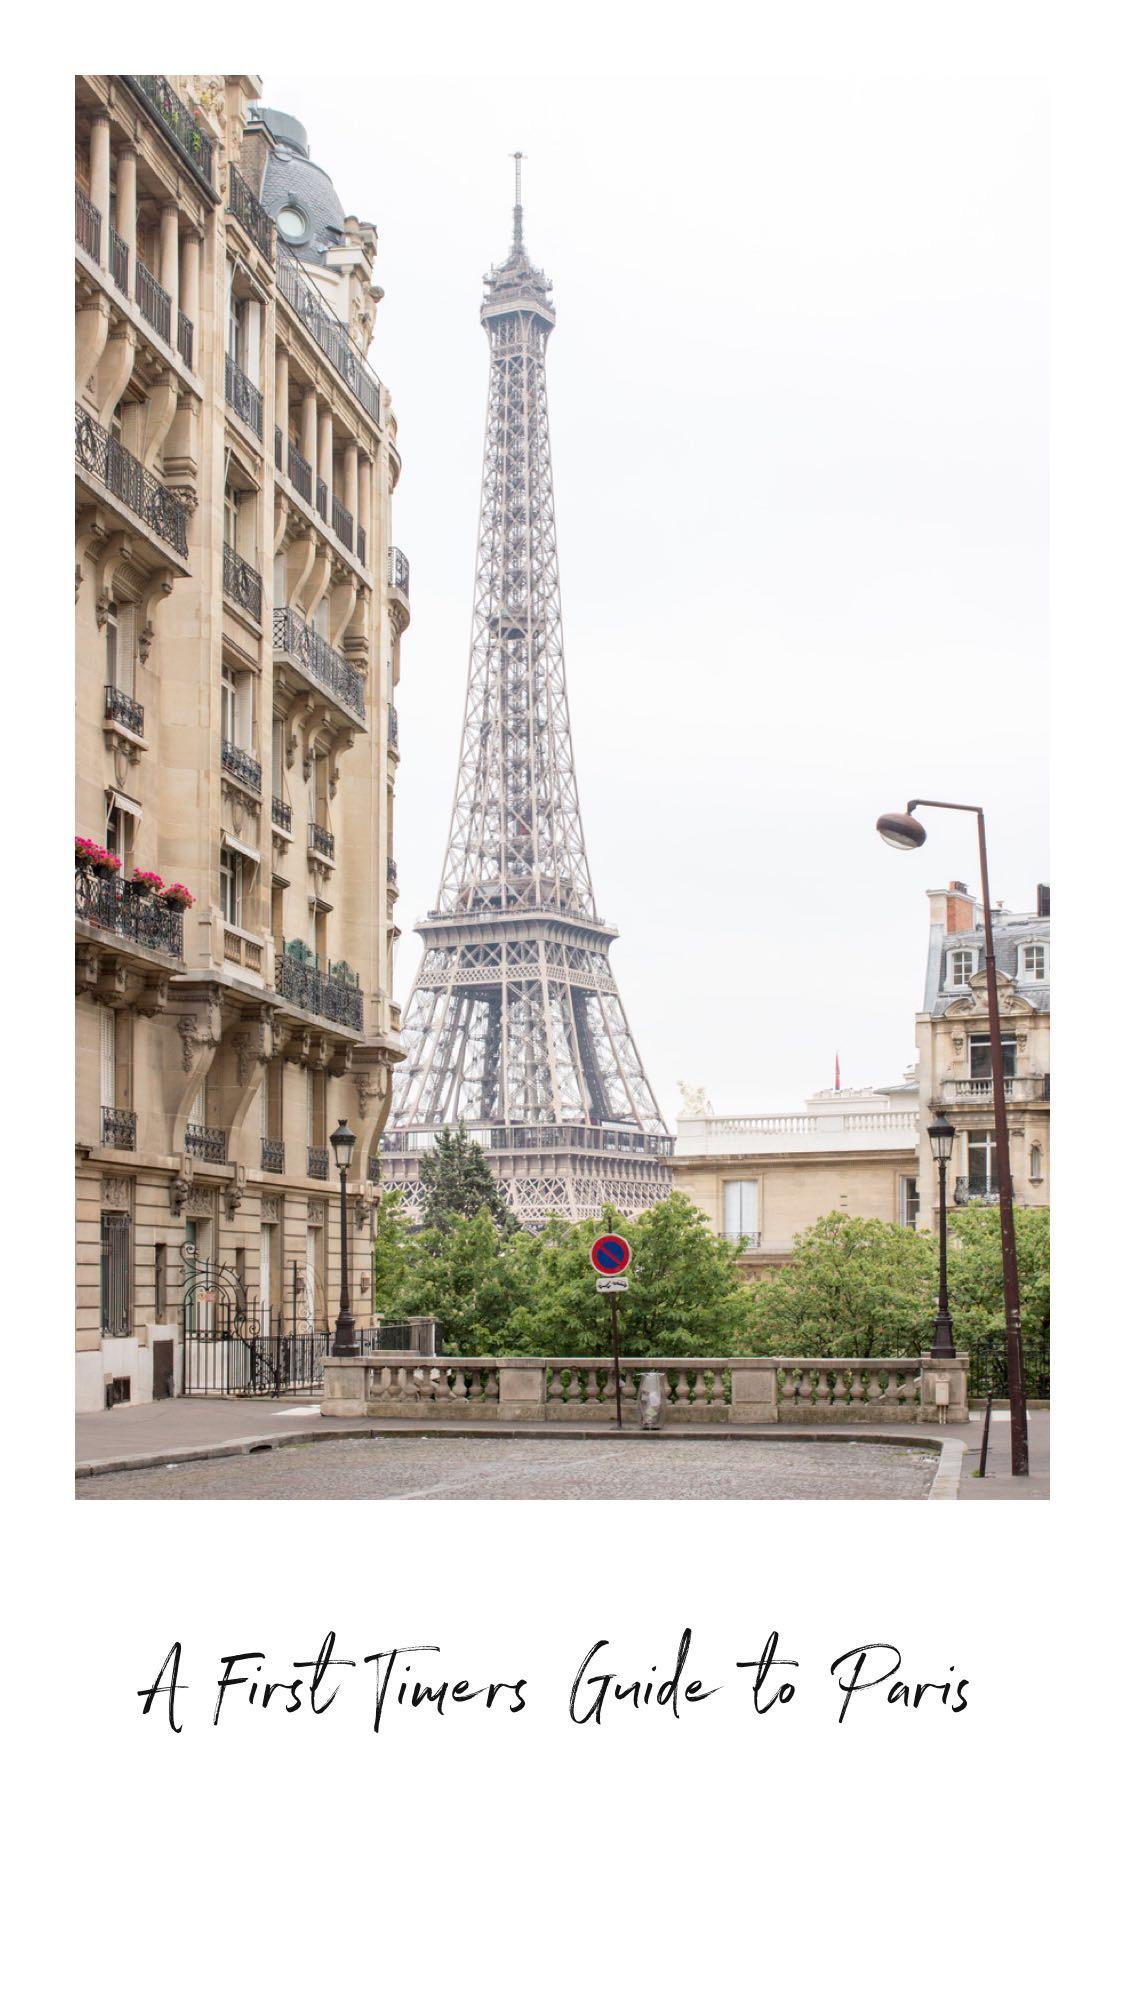 first time guide to paris, france via everyday parisian